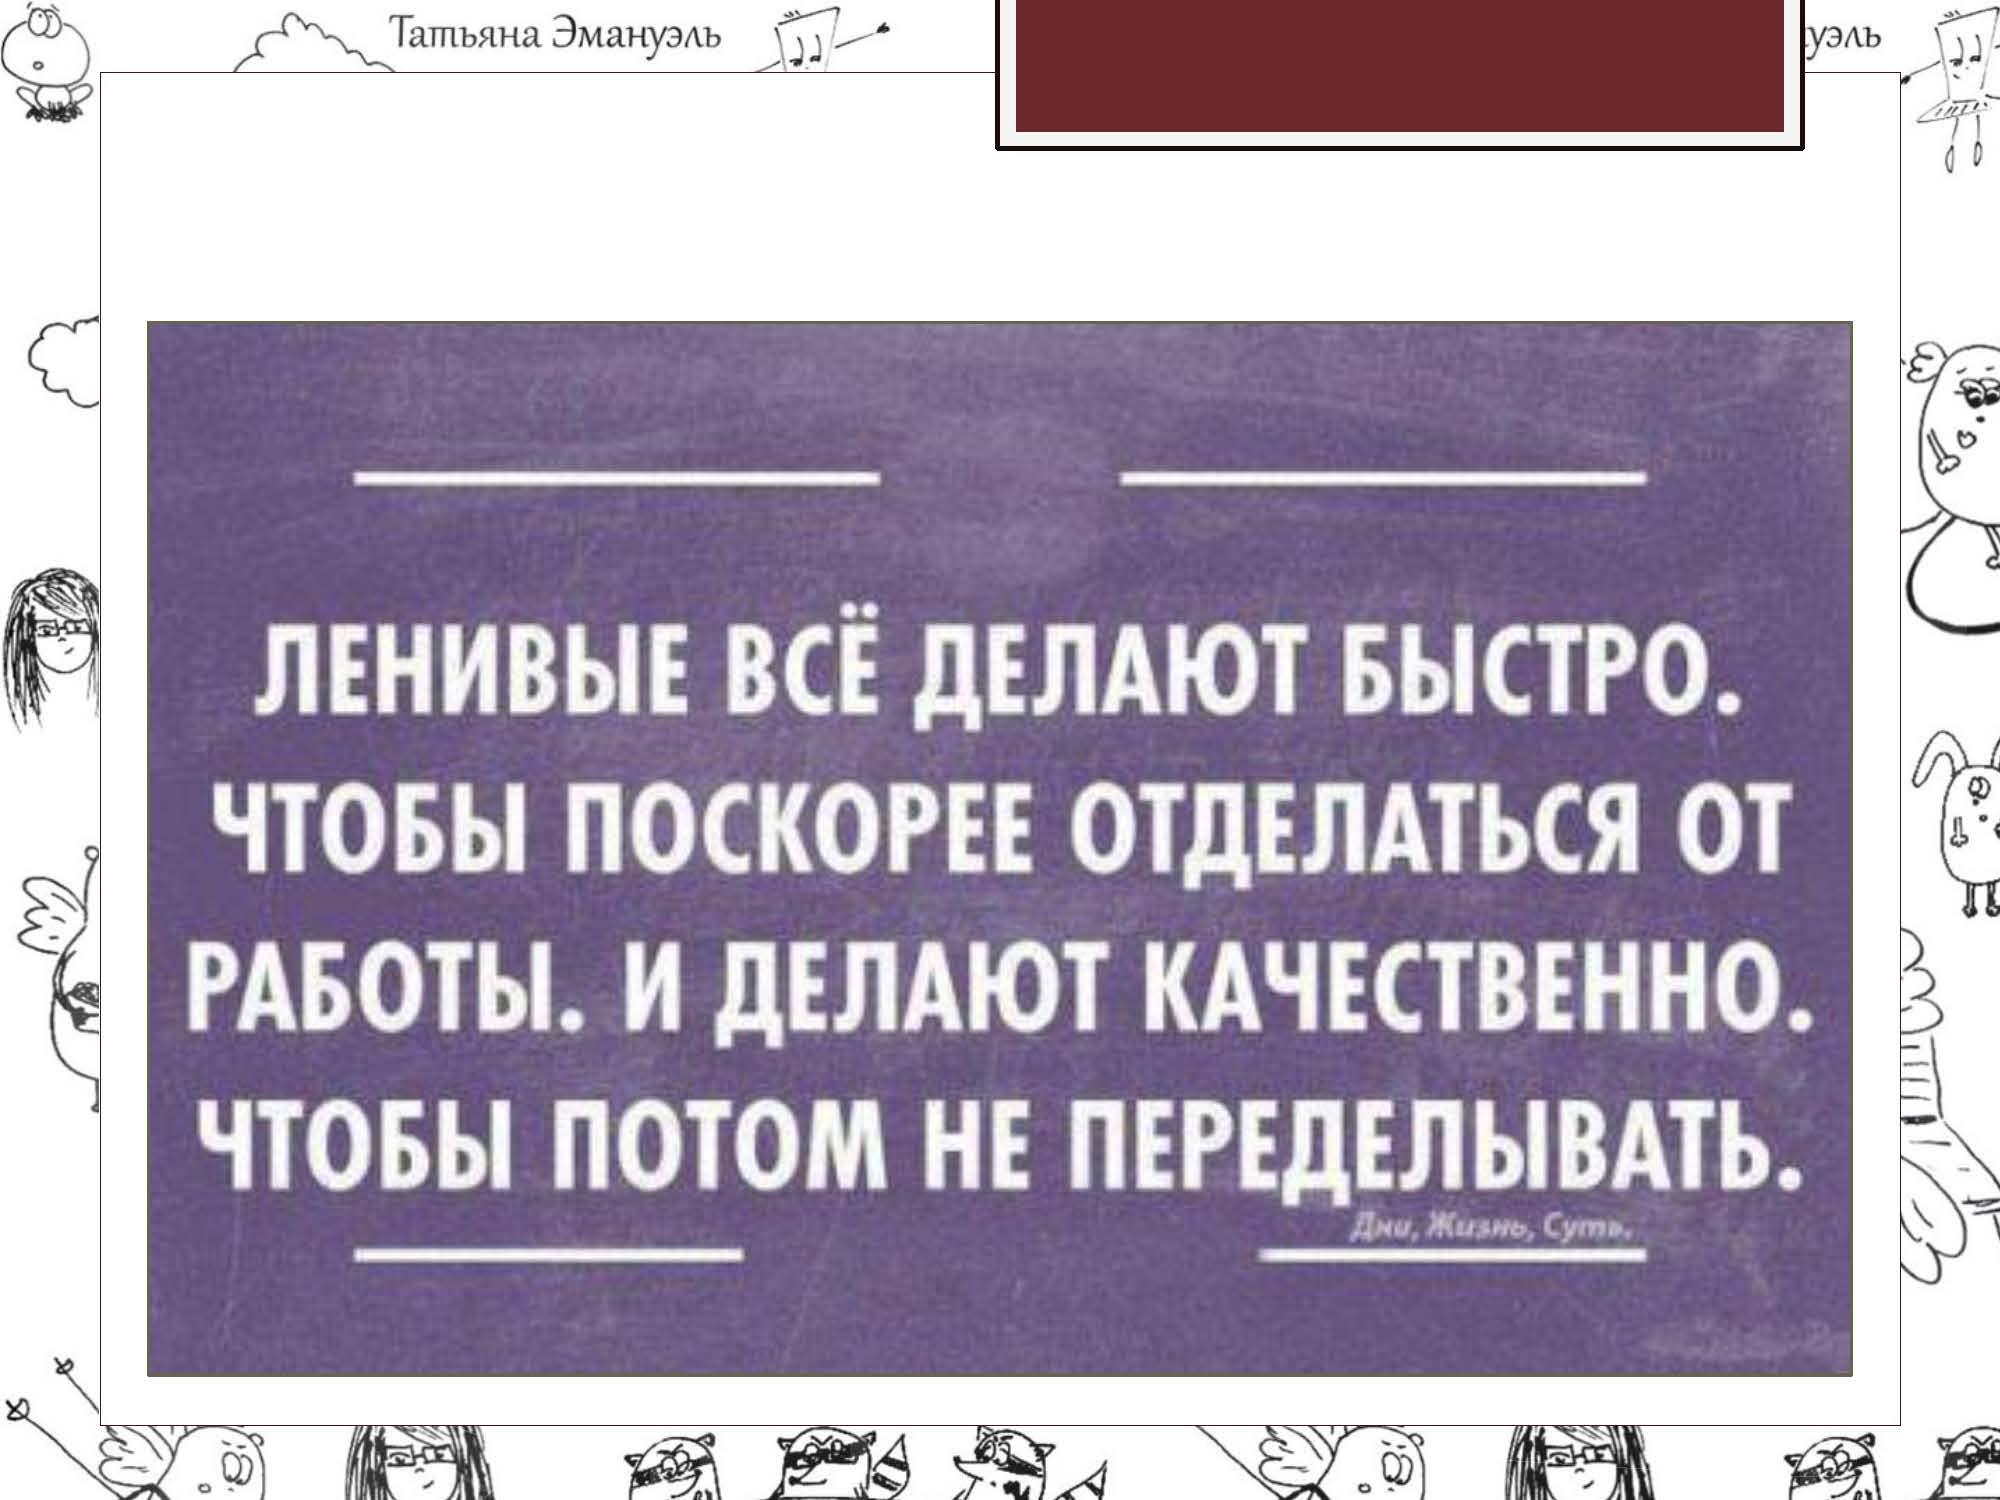 06 февраля эмануэль_Страница_042